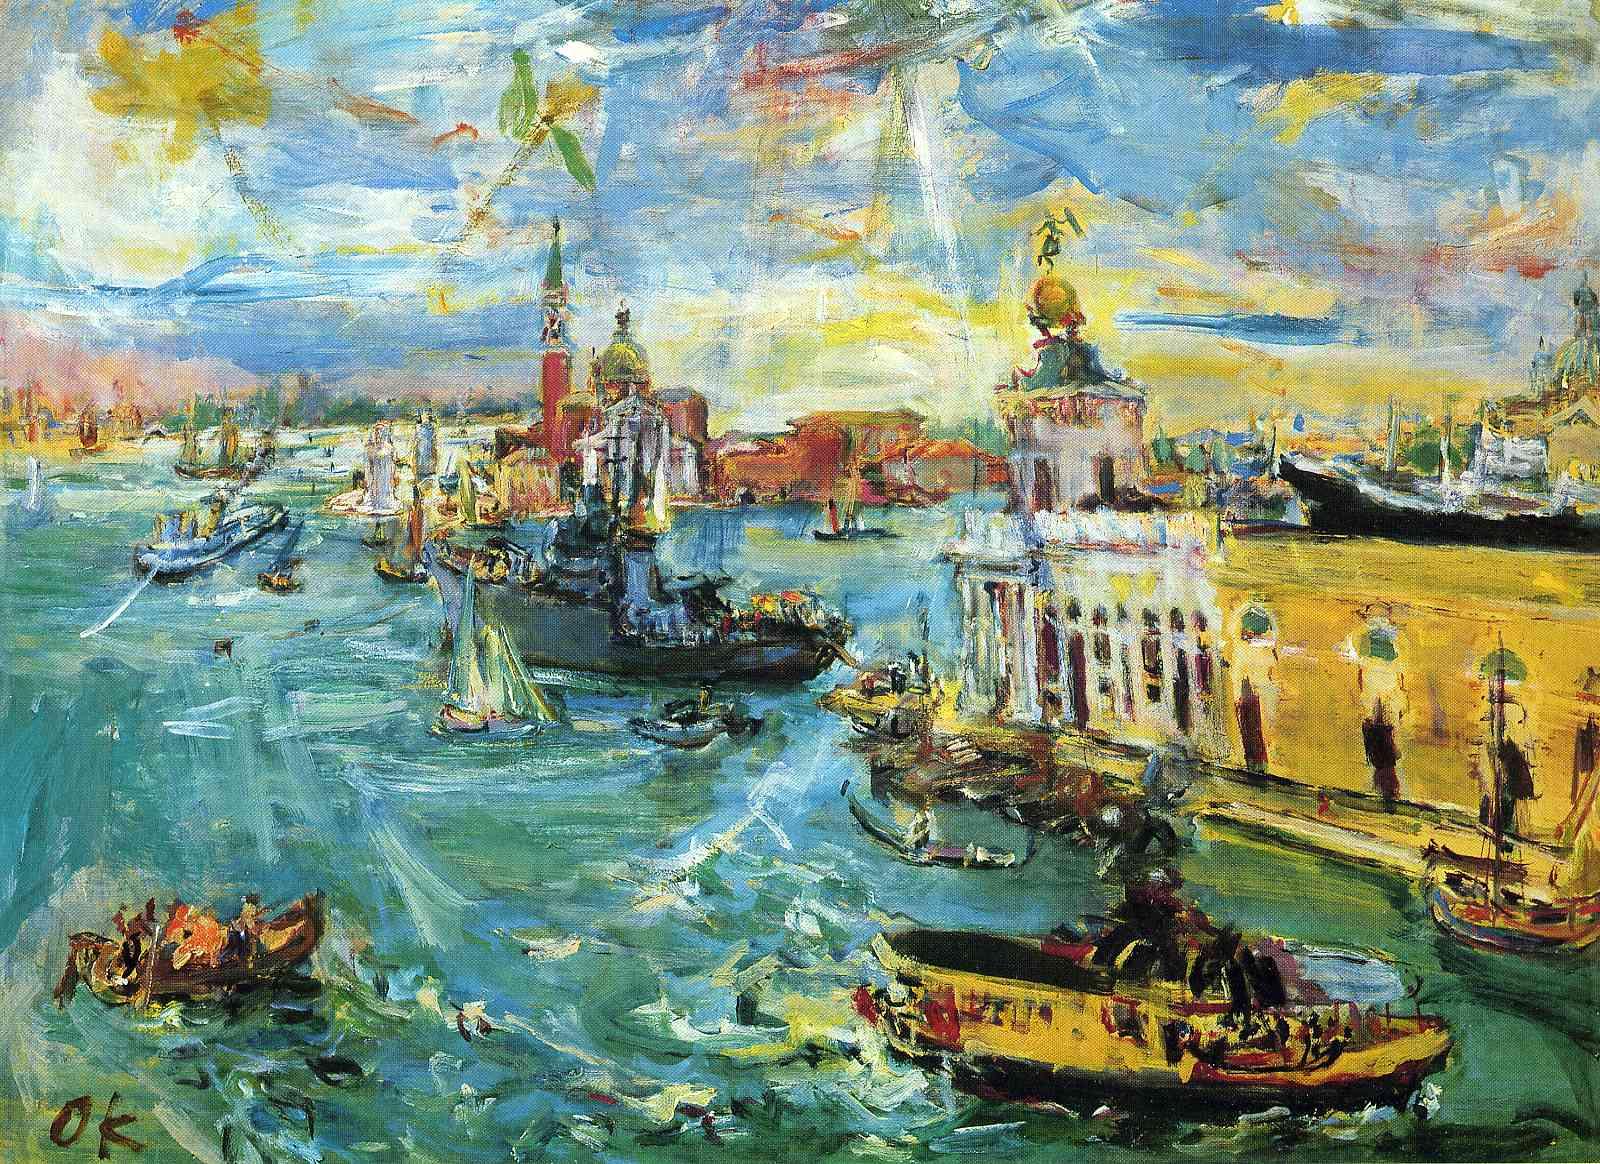 German Expressionism, German Expressionist painting by Oskar Kokoschka